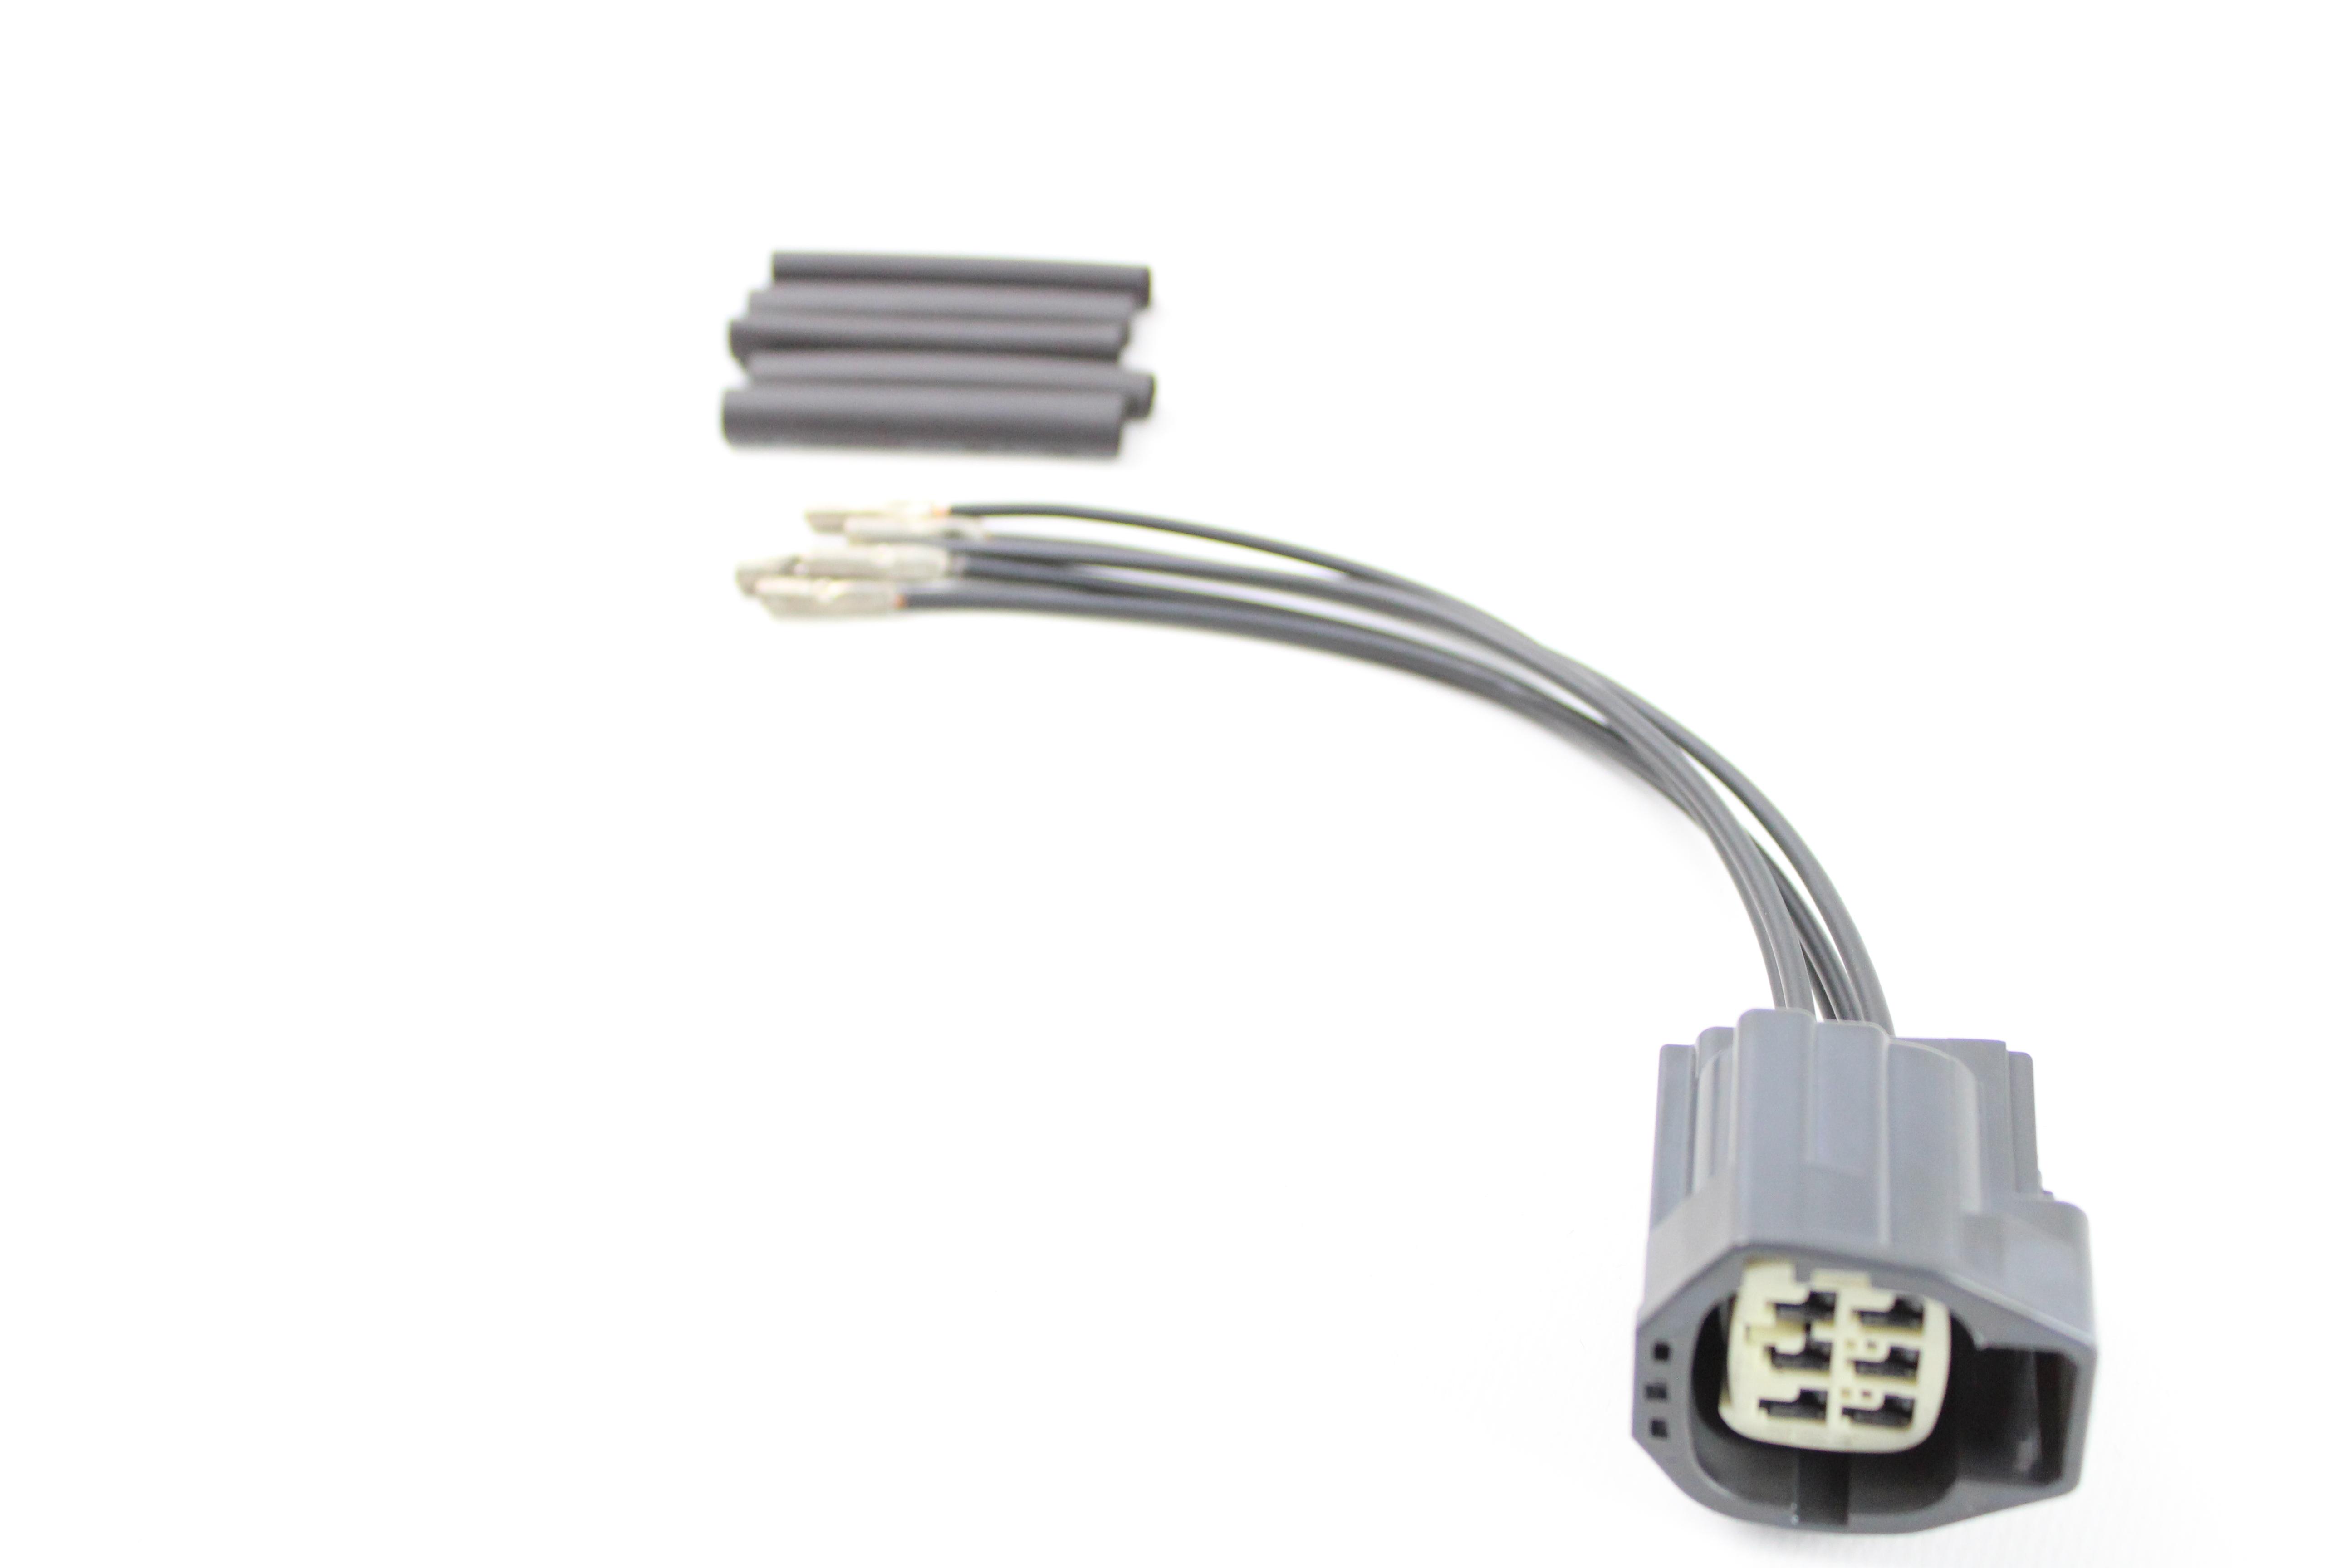 Fan Clutch Wiring Harness - Universal Wiring Diagrams device-please -  device-please.sceglicongusto.itdiagram database - sceglicongusto.it